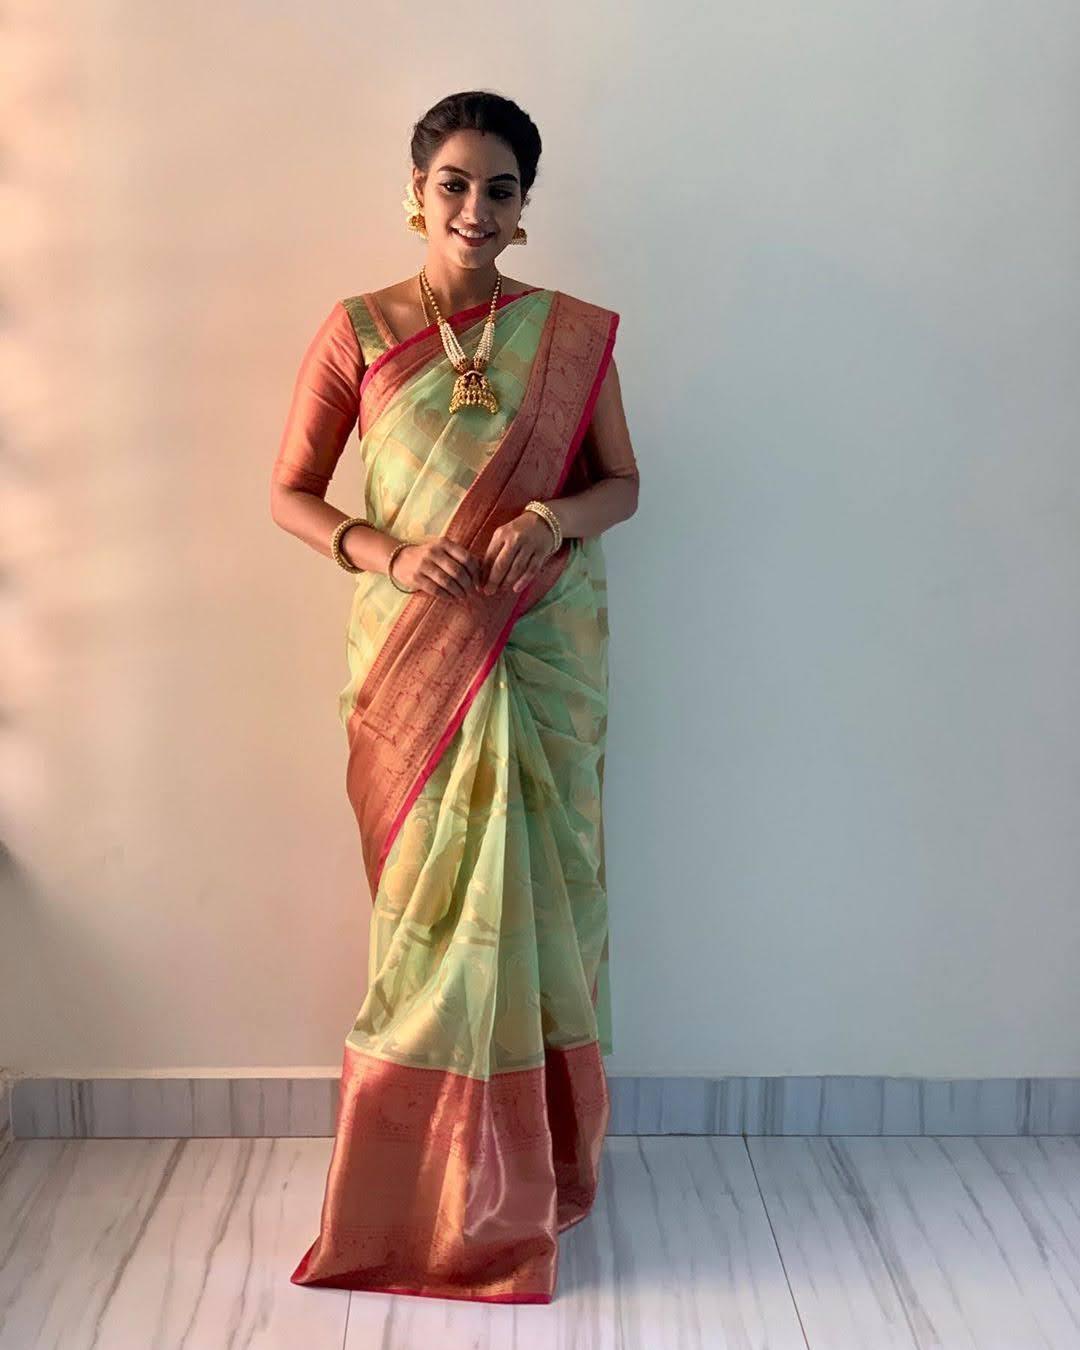 pavithra-janani-64644